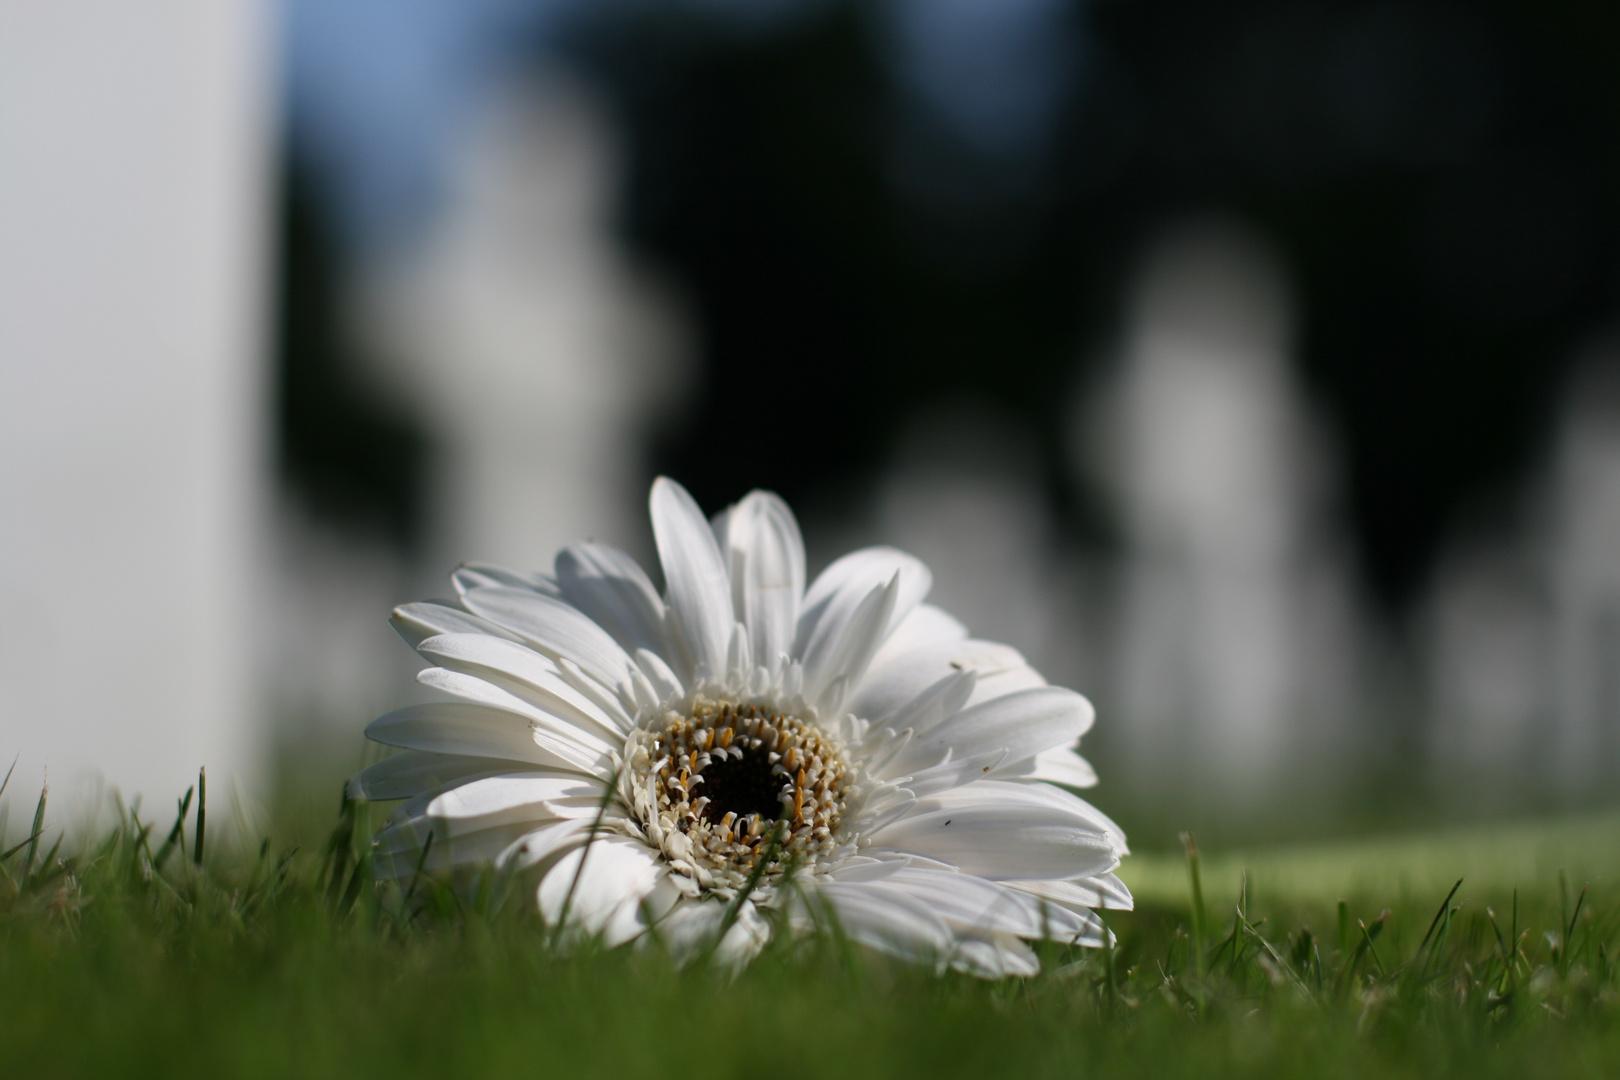 Cimitero Americano - Colleville sur mer